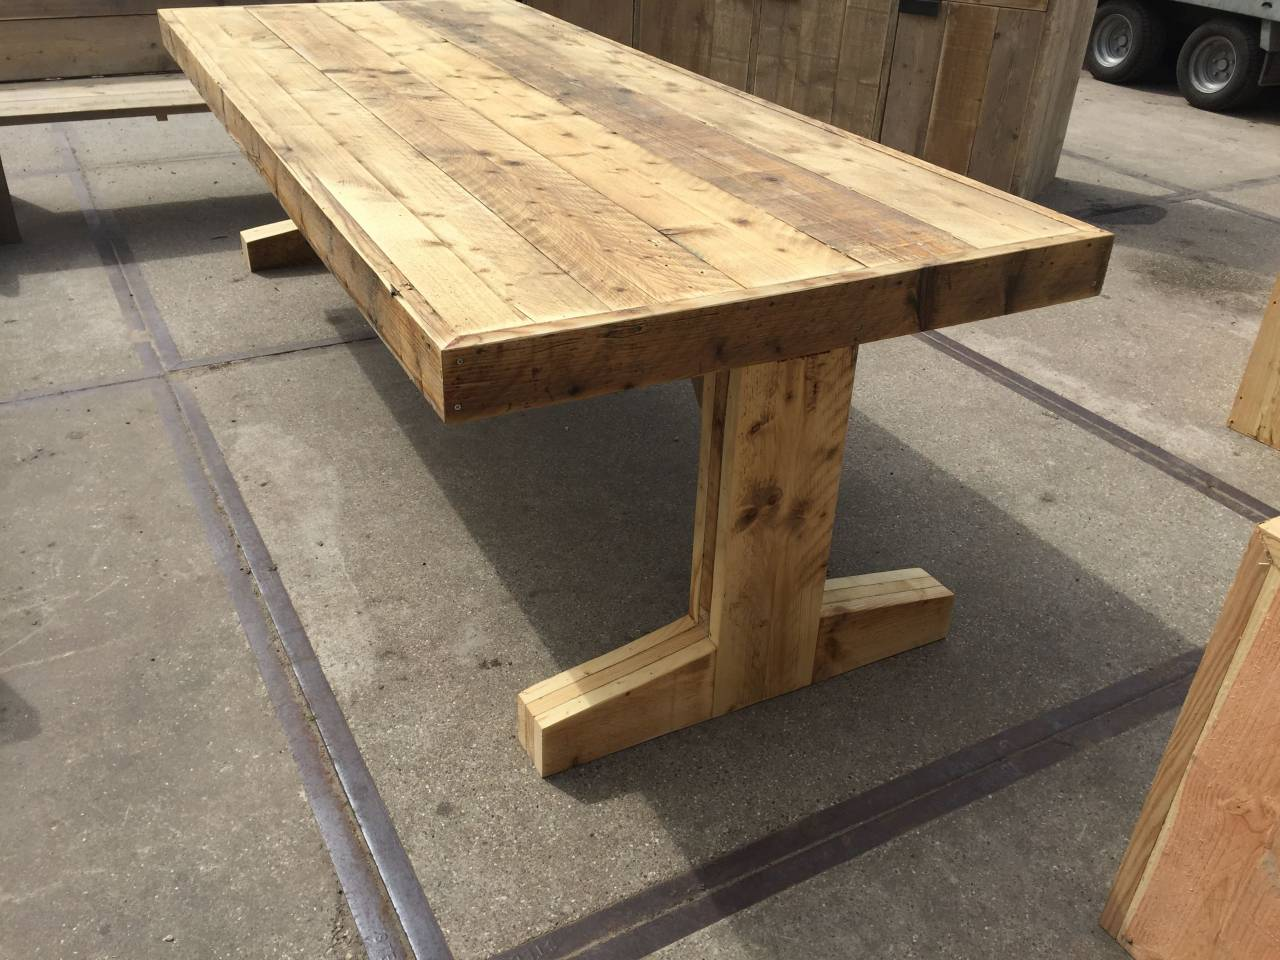 Tafels module steigerhout furniture unieke steigerhouten